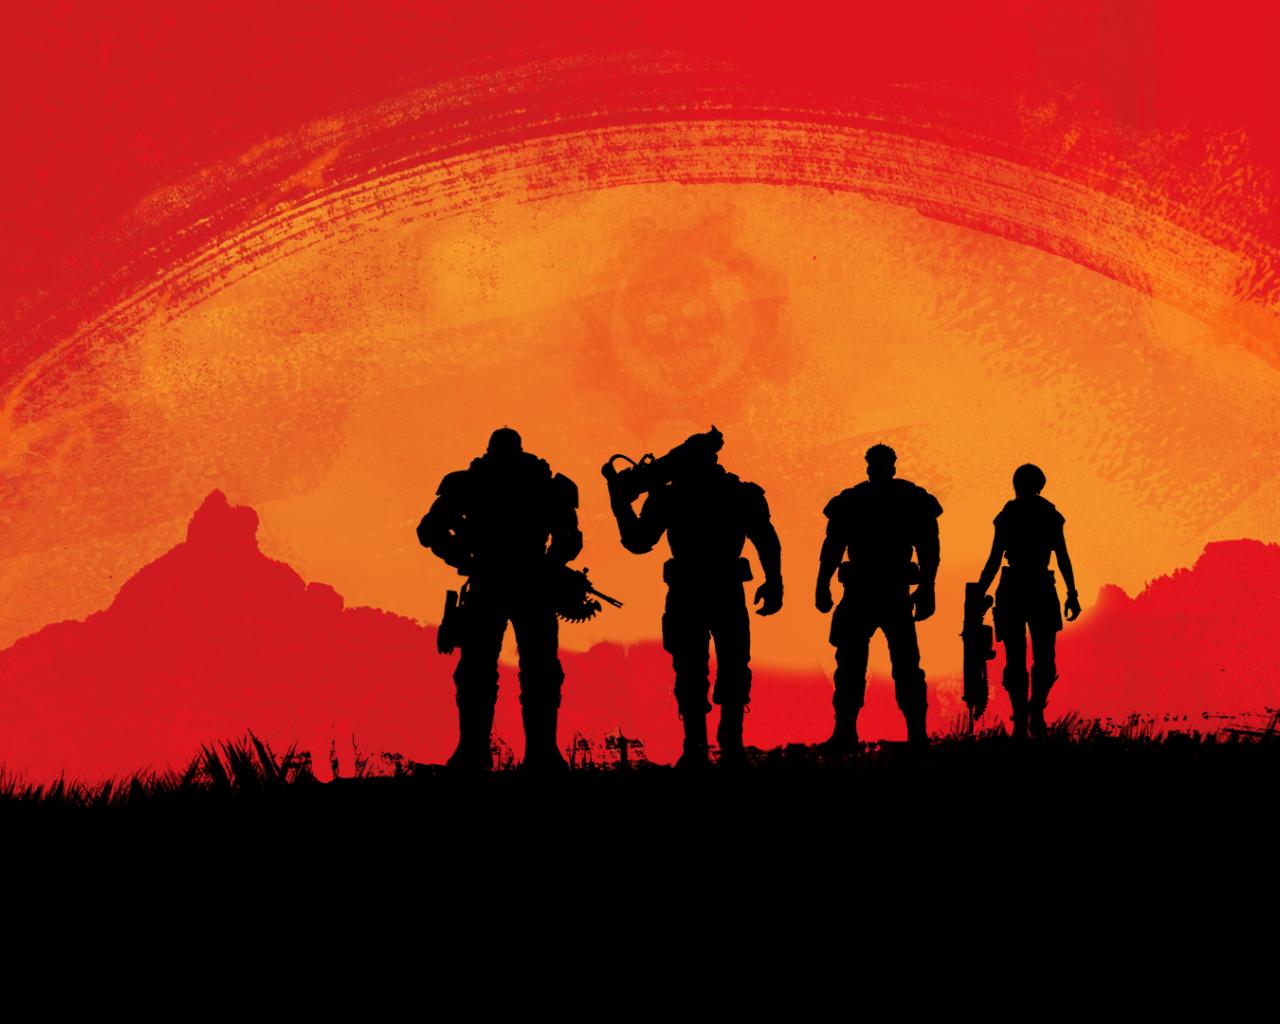 Free Download Red Dead Redemption 2 Rockstar Wallpaper Widescreen